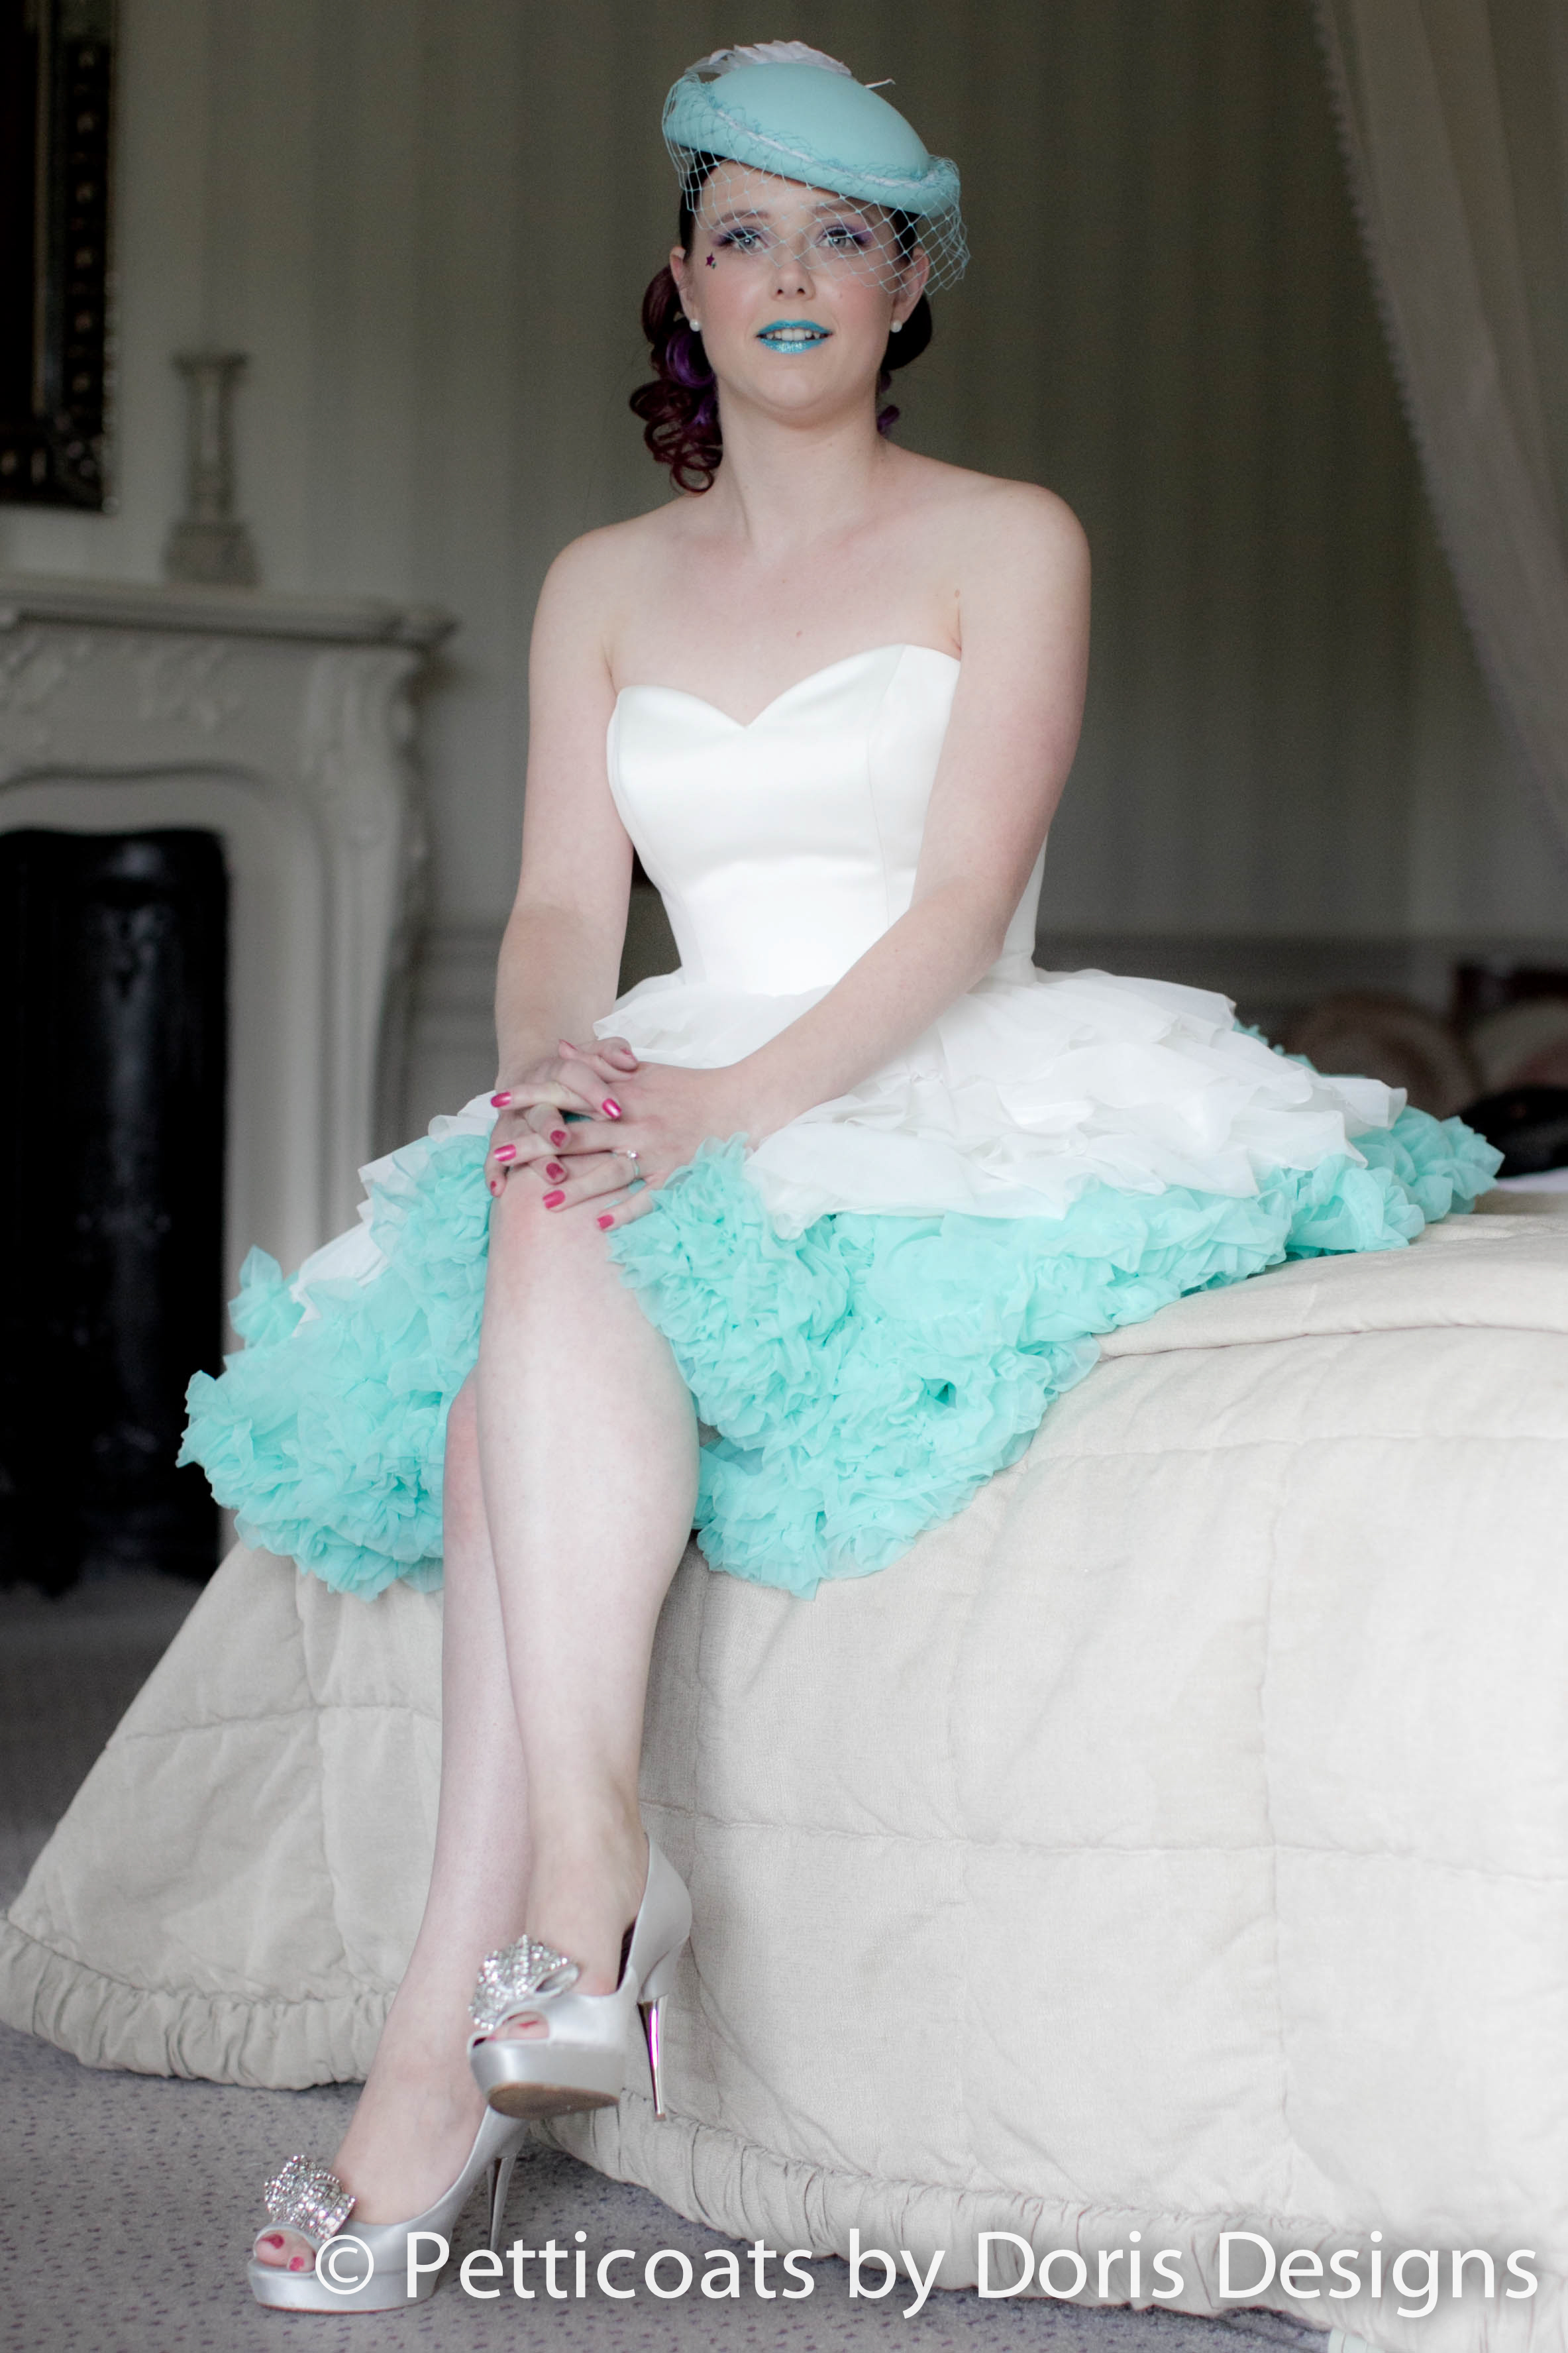 Fifties Style Petticoat - Doris Petticoats - Vintage Wedding Shoot